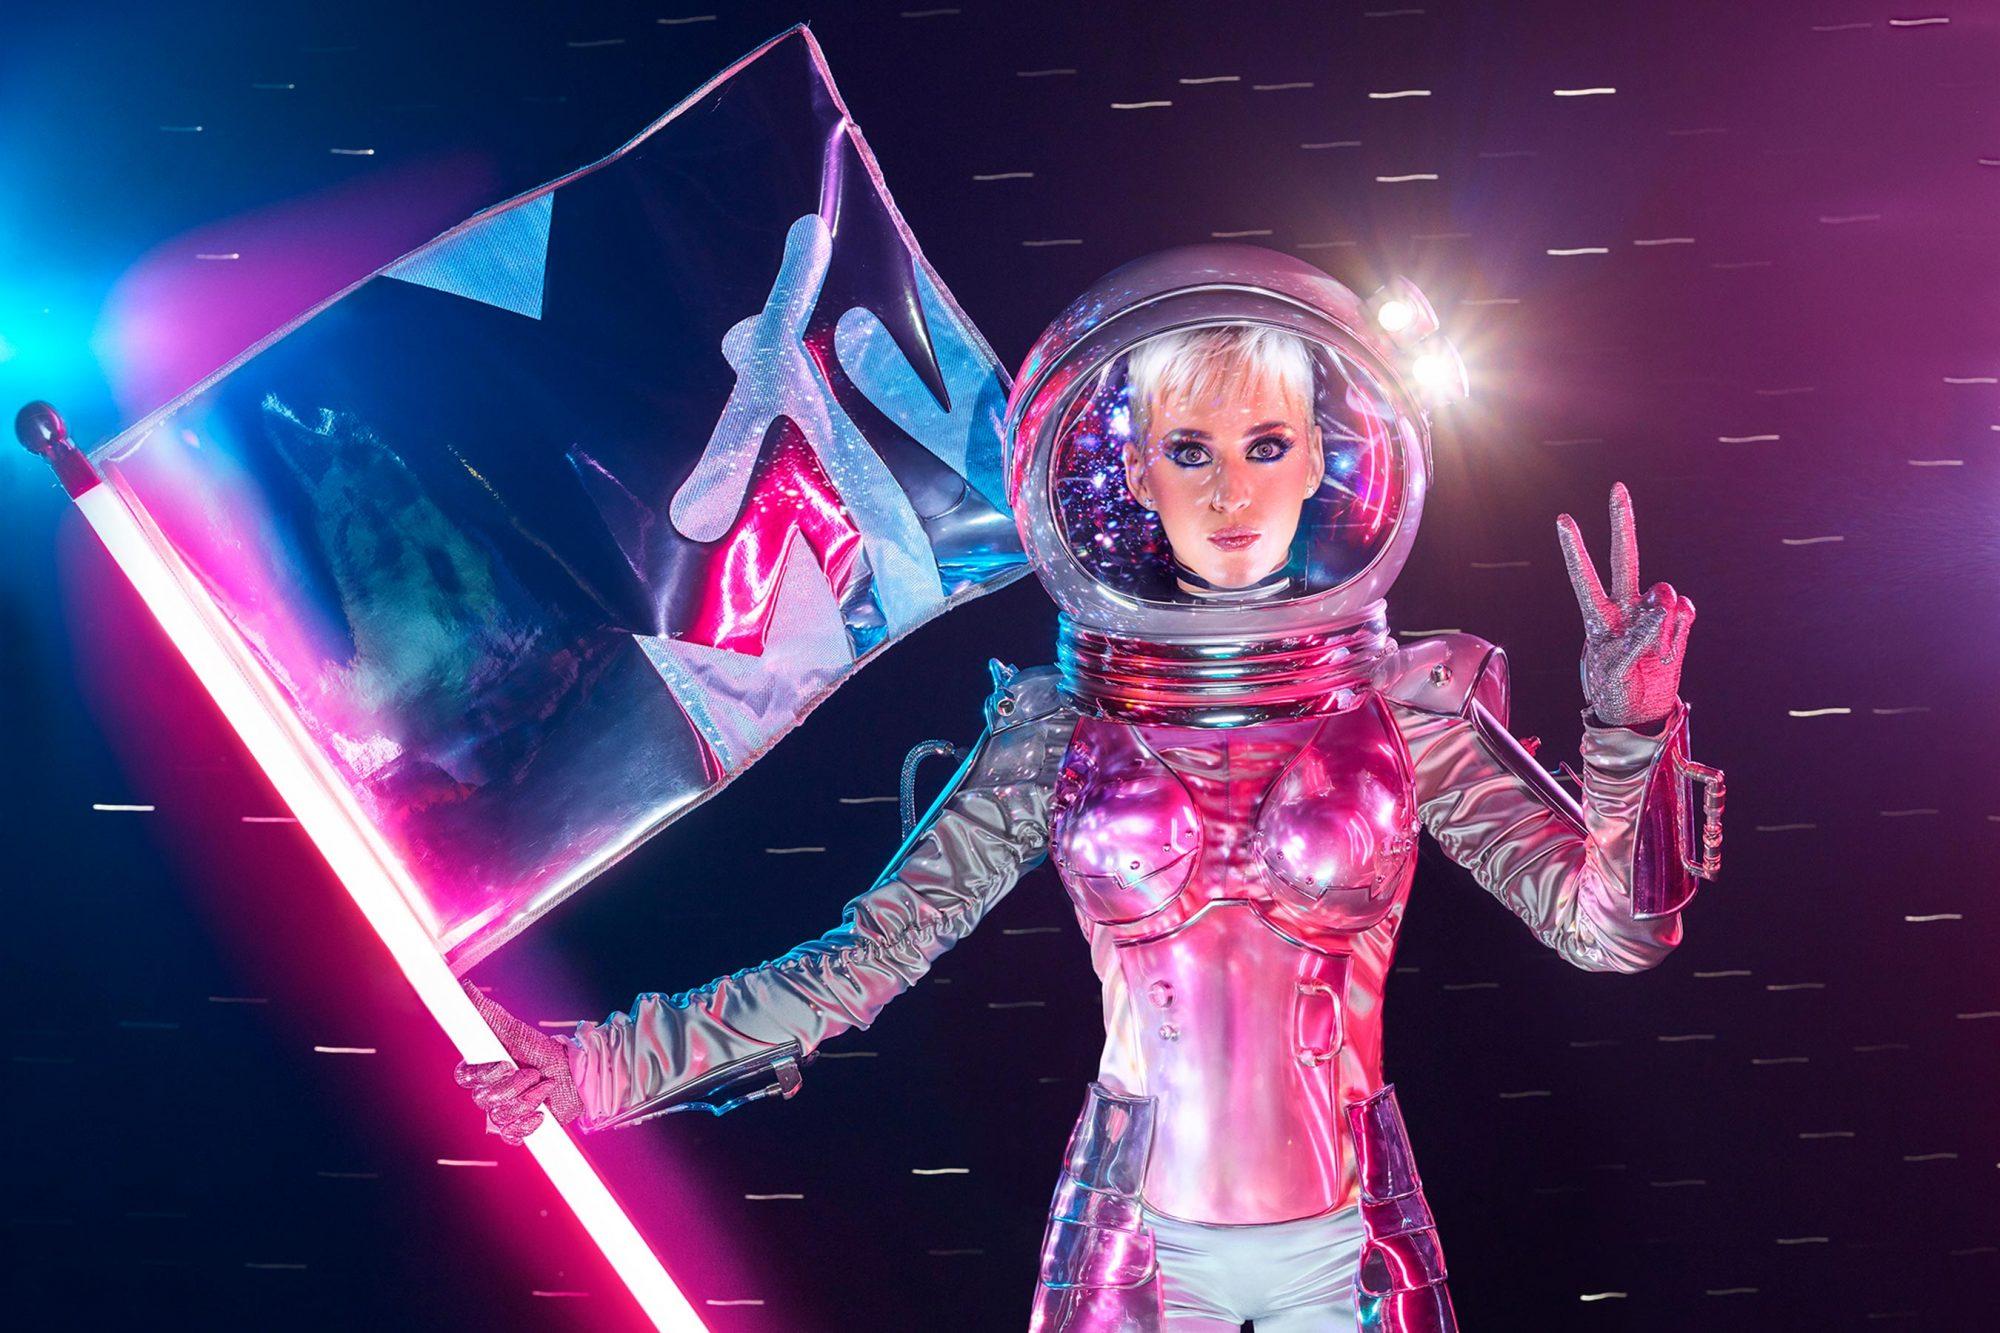 MTV's Video Music Awards 2017Host: Katy Perry